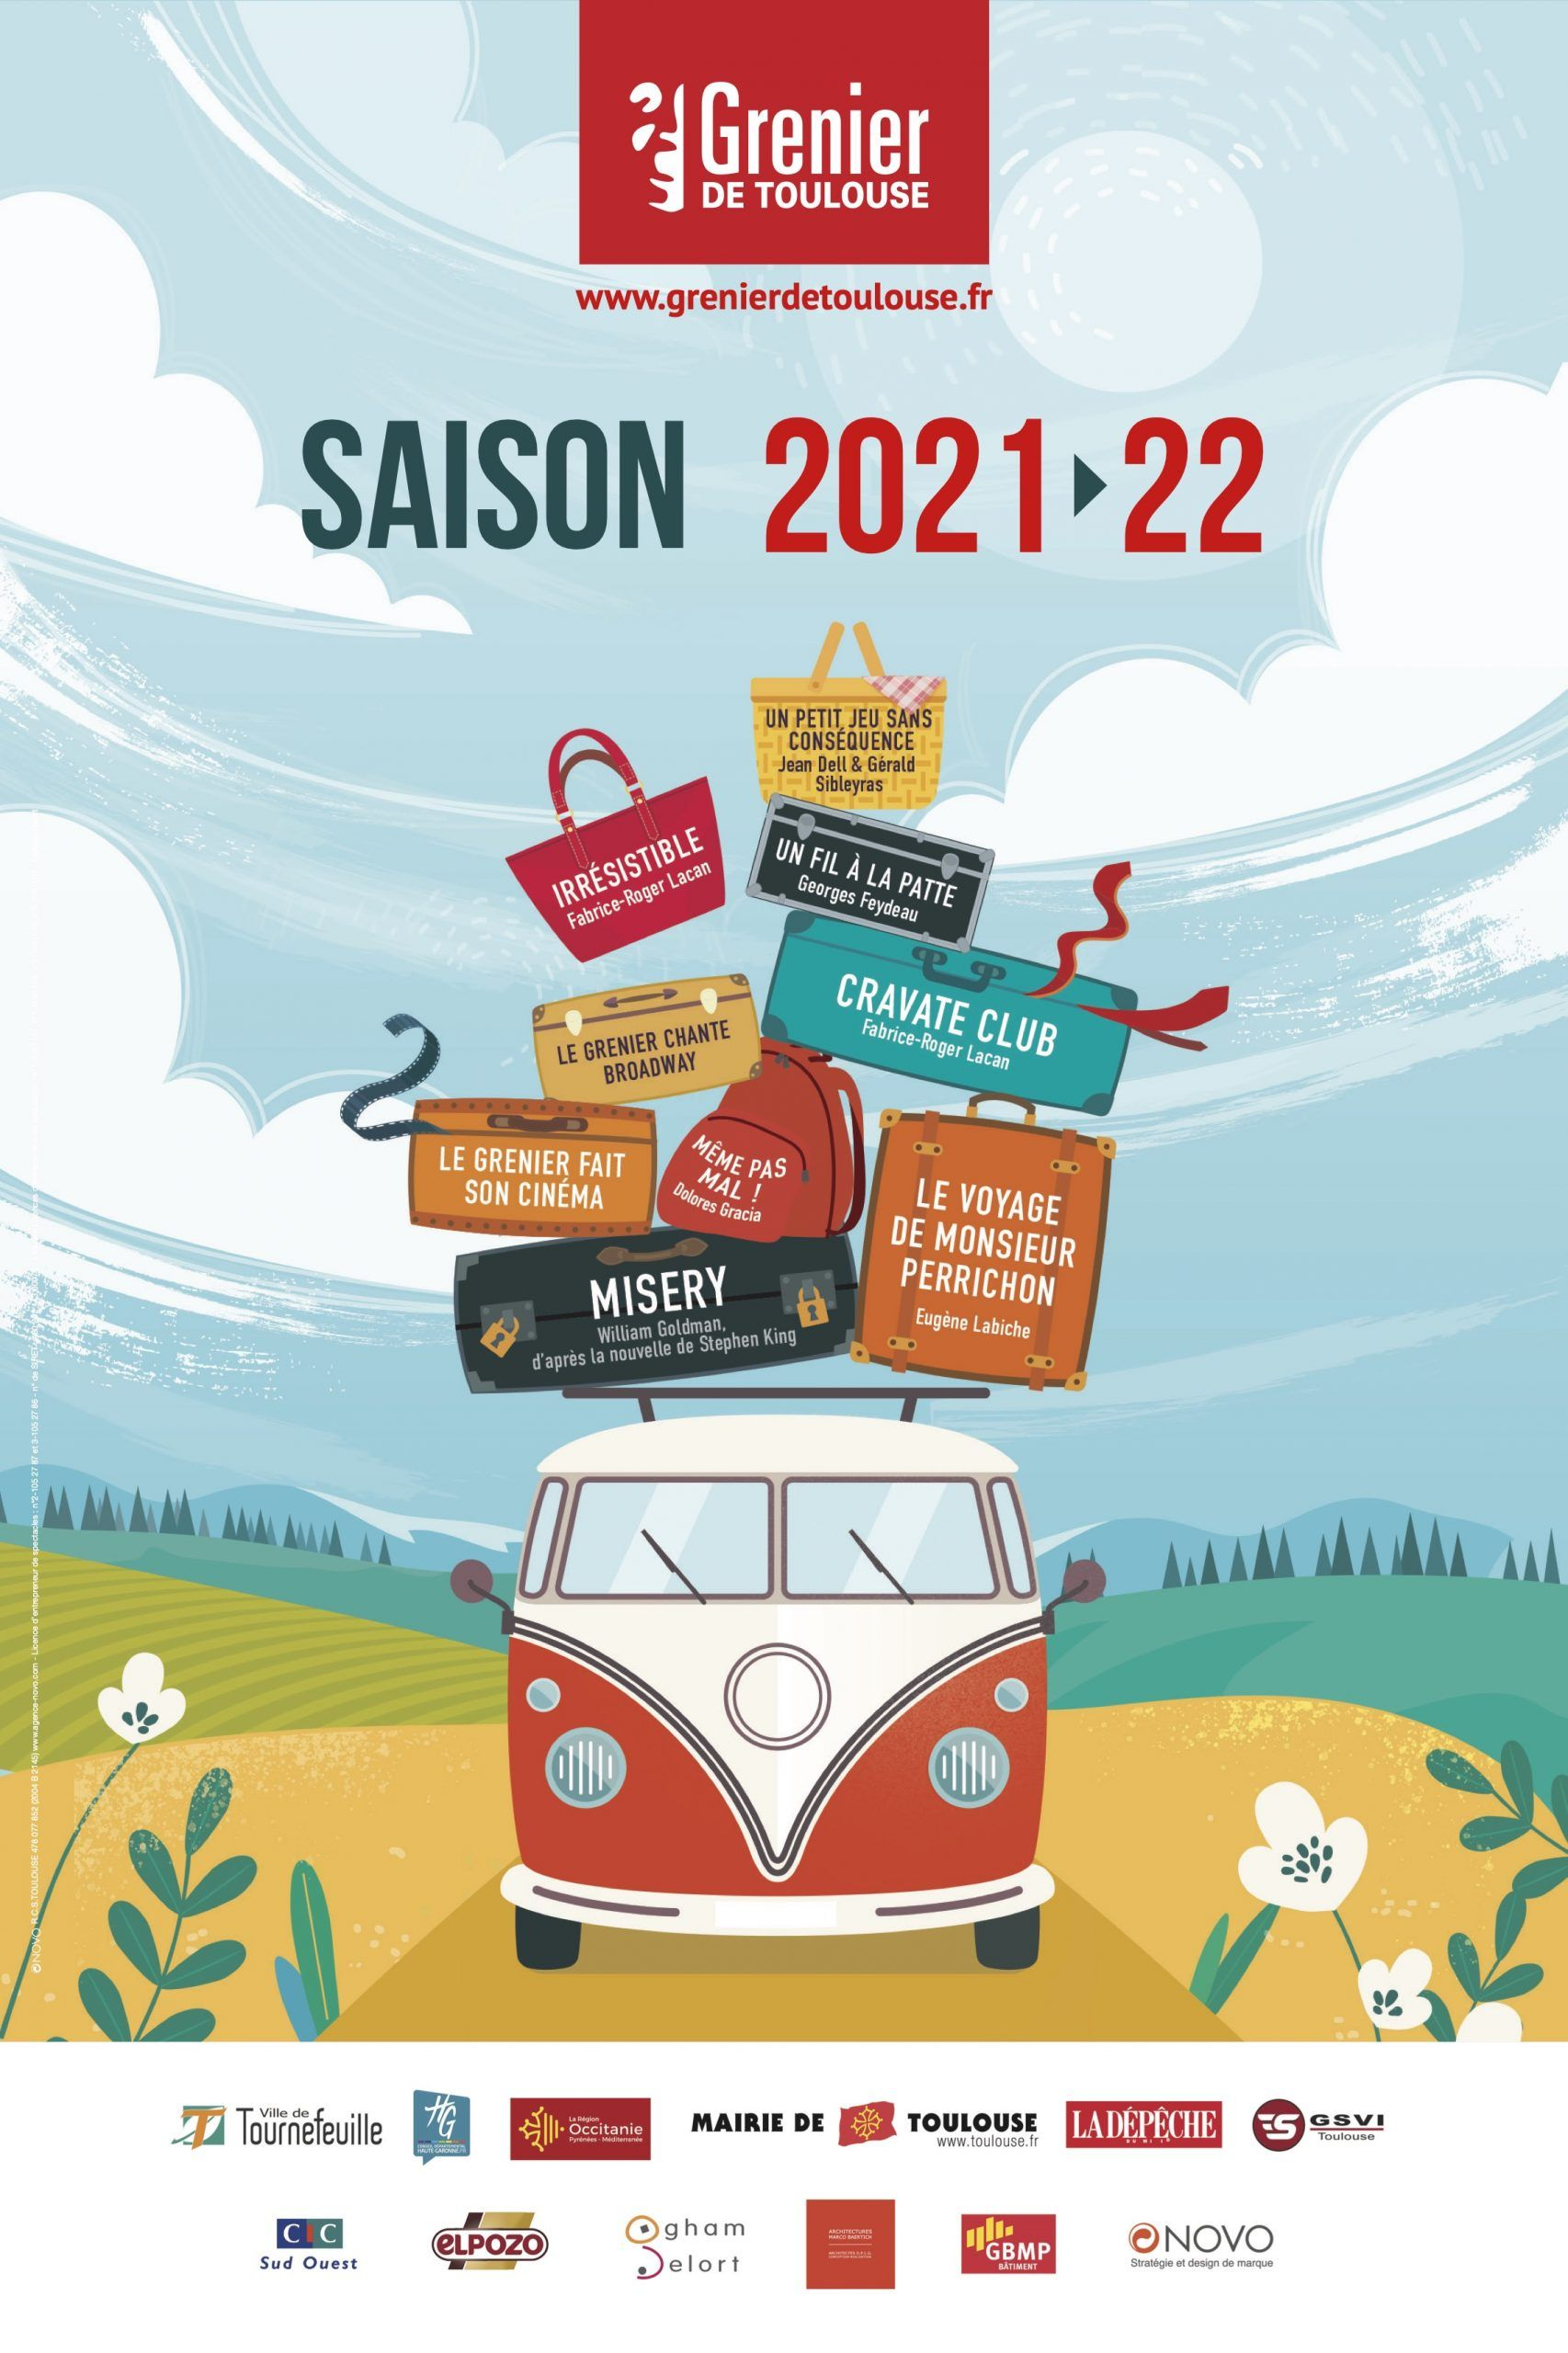 Grenier de Toulouse - Saison 21/22